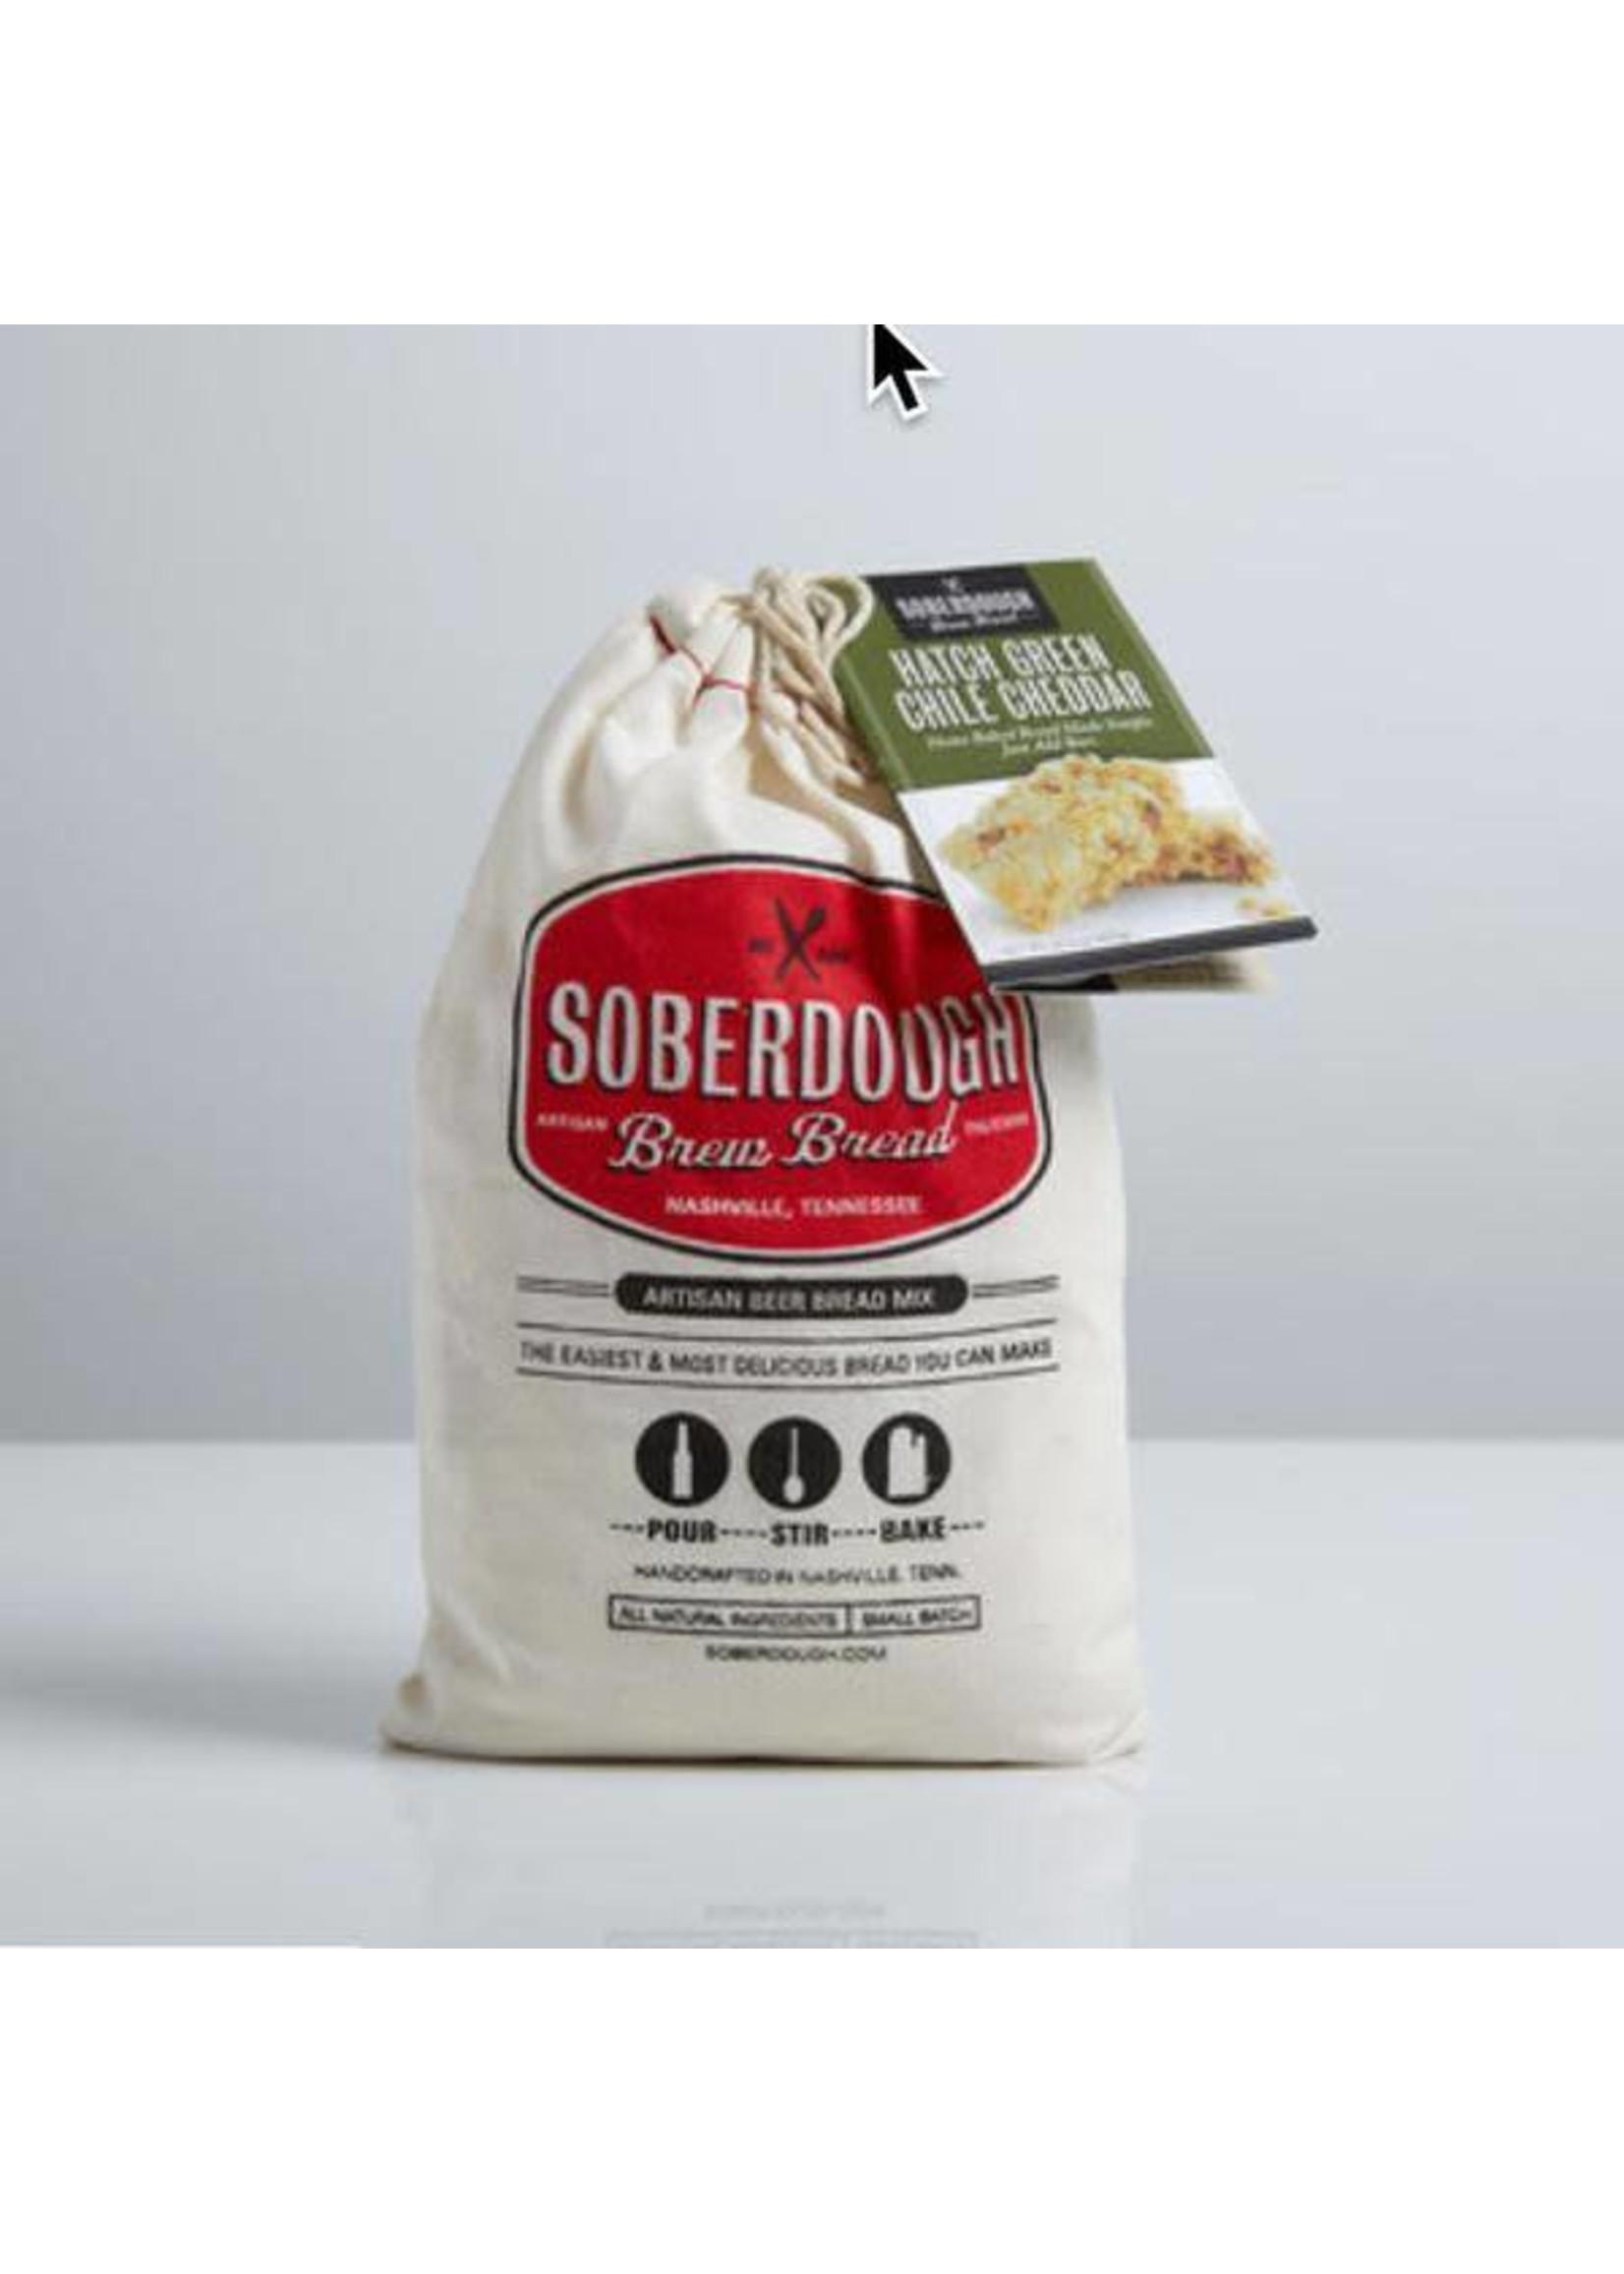 Soberdough Green Chili Cheddar Brew Bread Mix